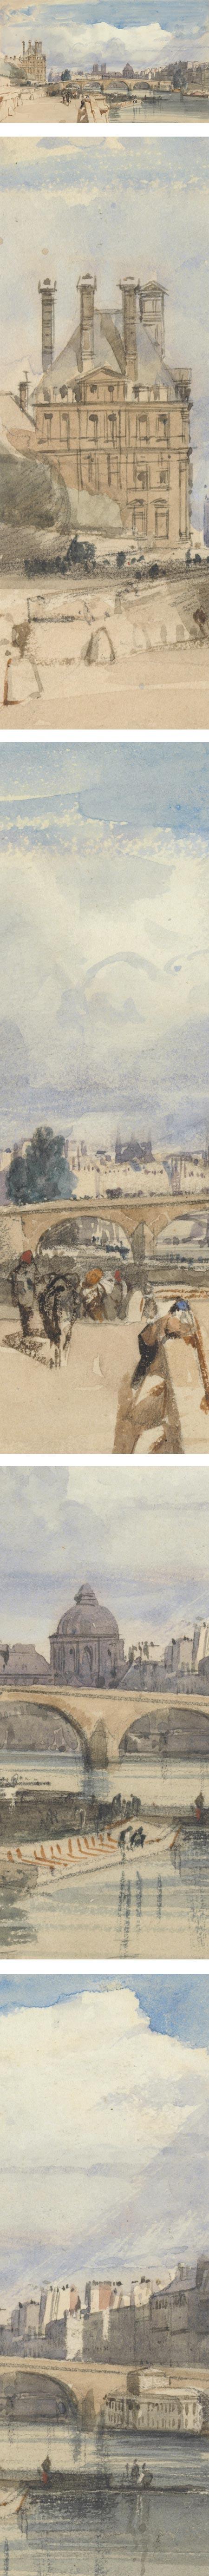 Le Pont Royal, Paris; Thomas Shotter Boys , watercolor and ink